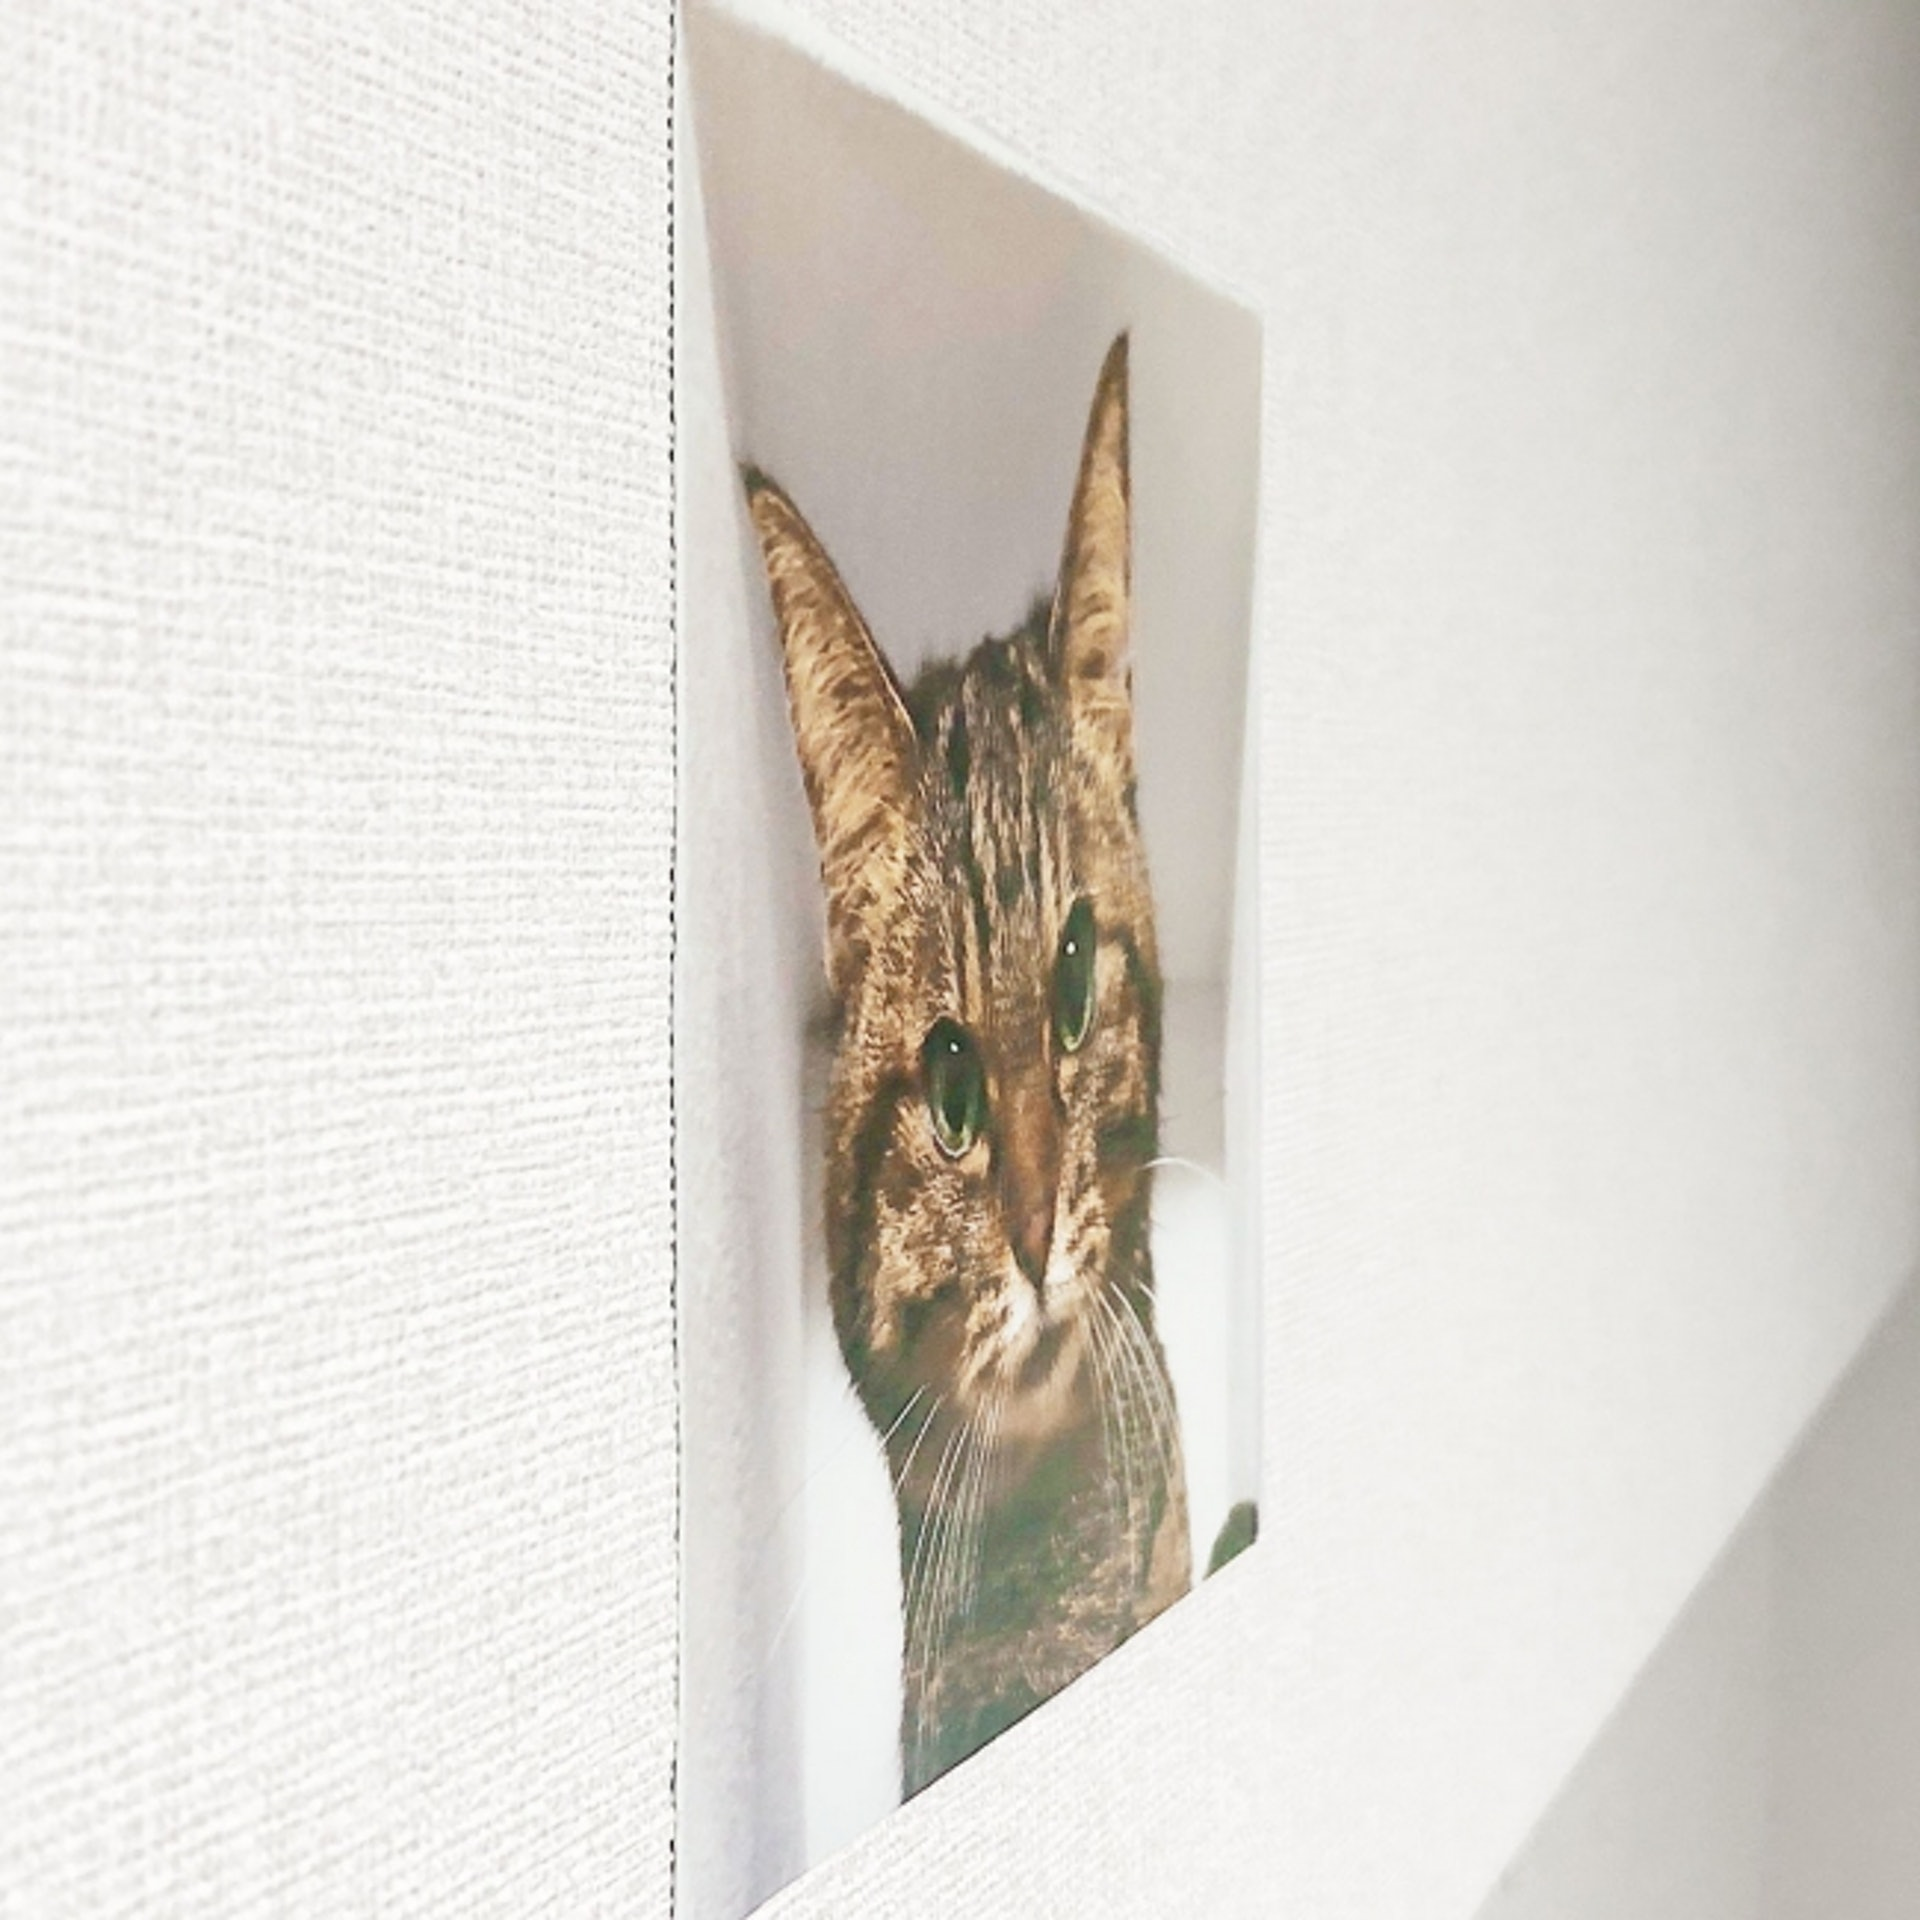 Delusion Mapping貓暗中觀察牆上貼紙:要企到好側先知係假像。